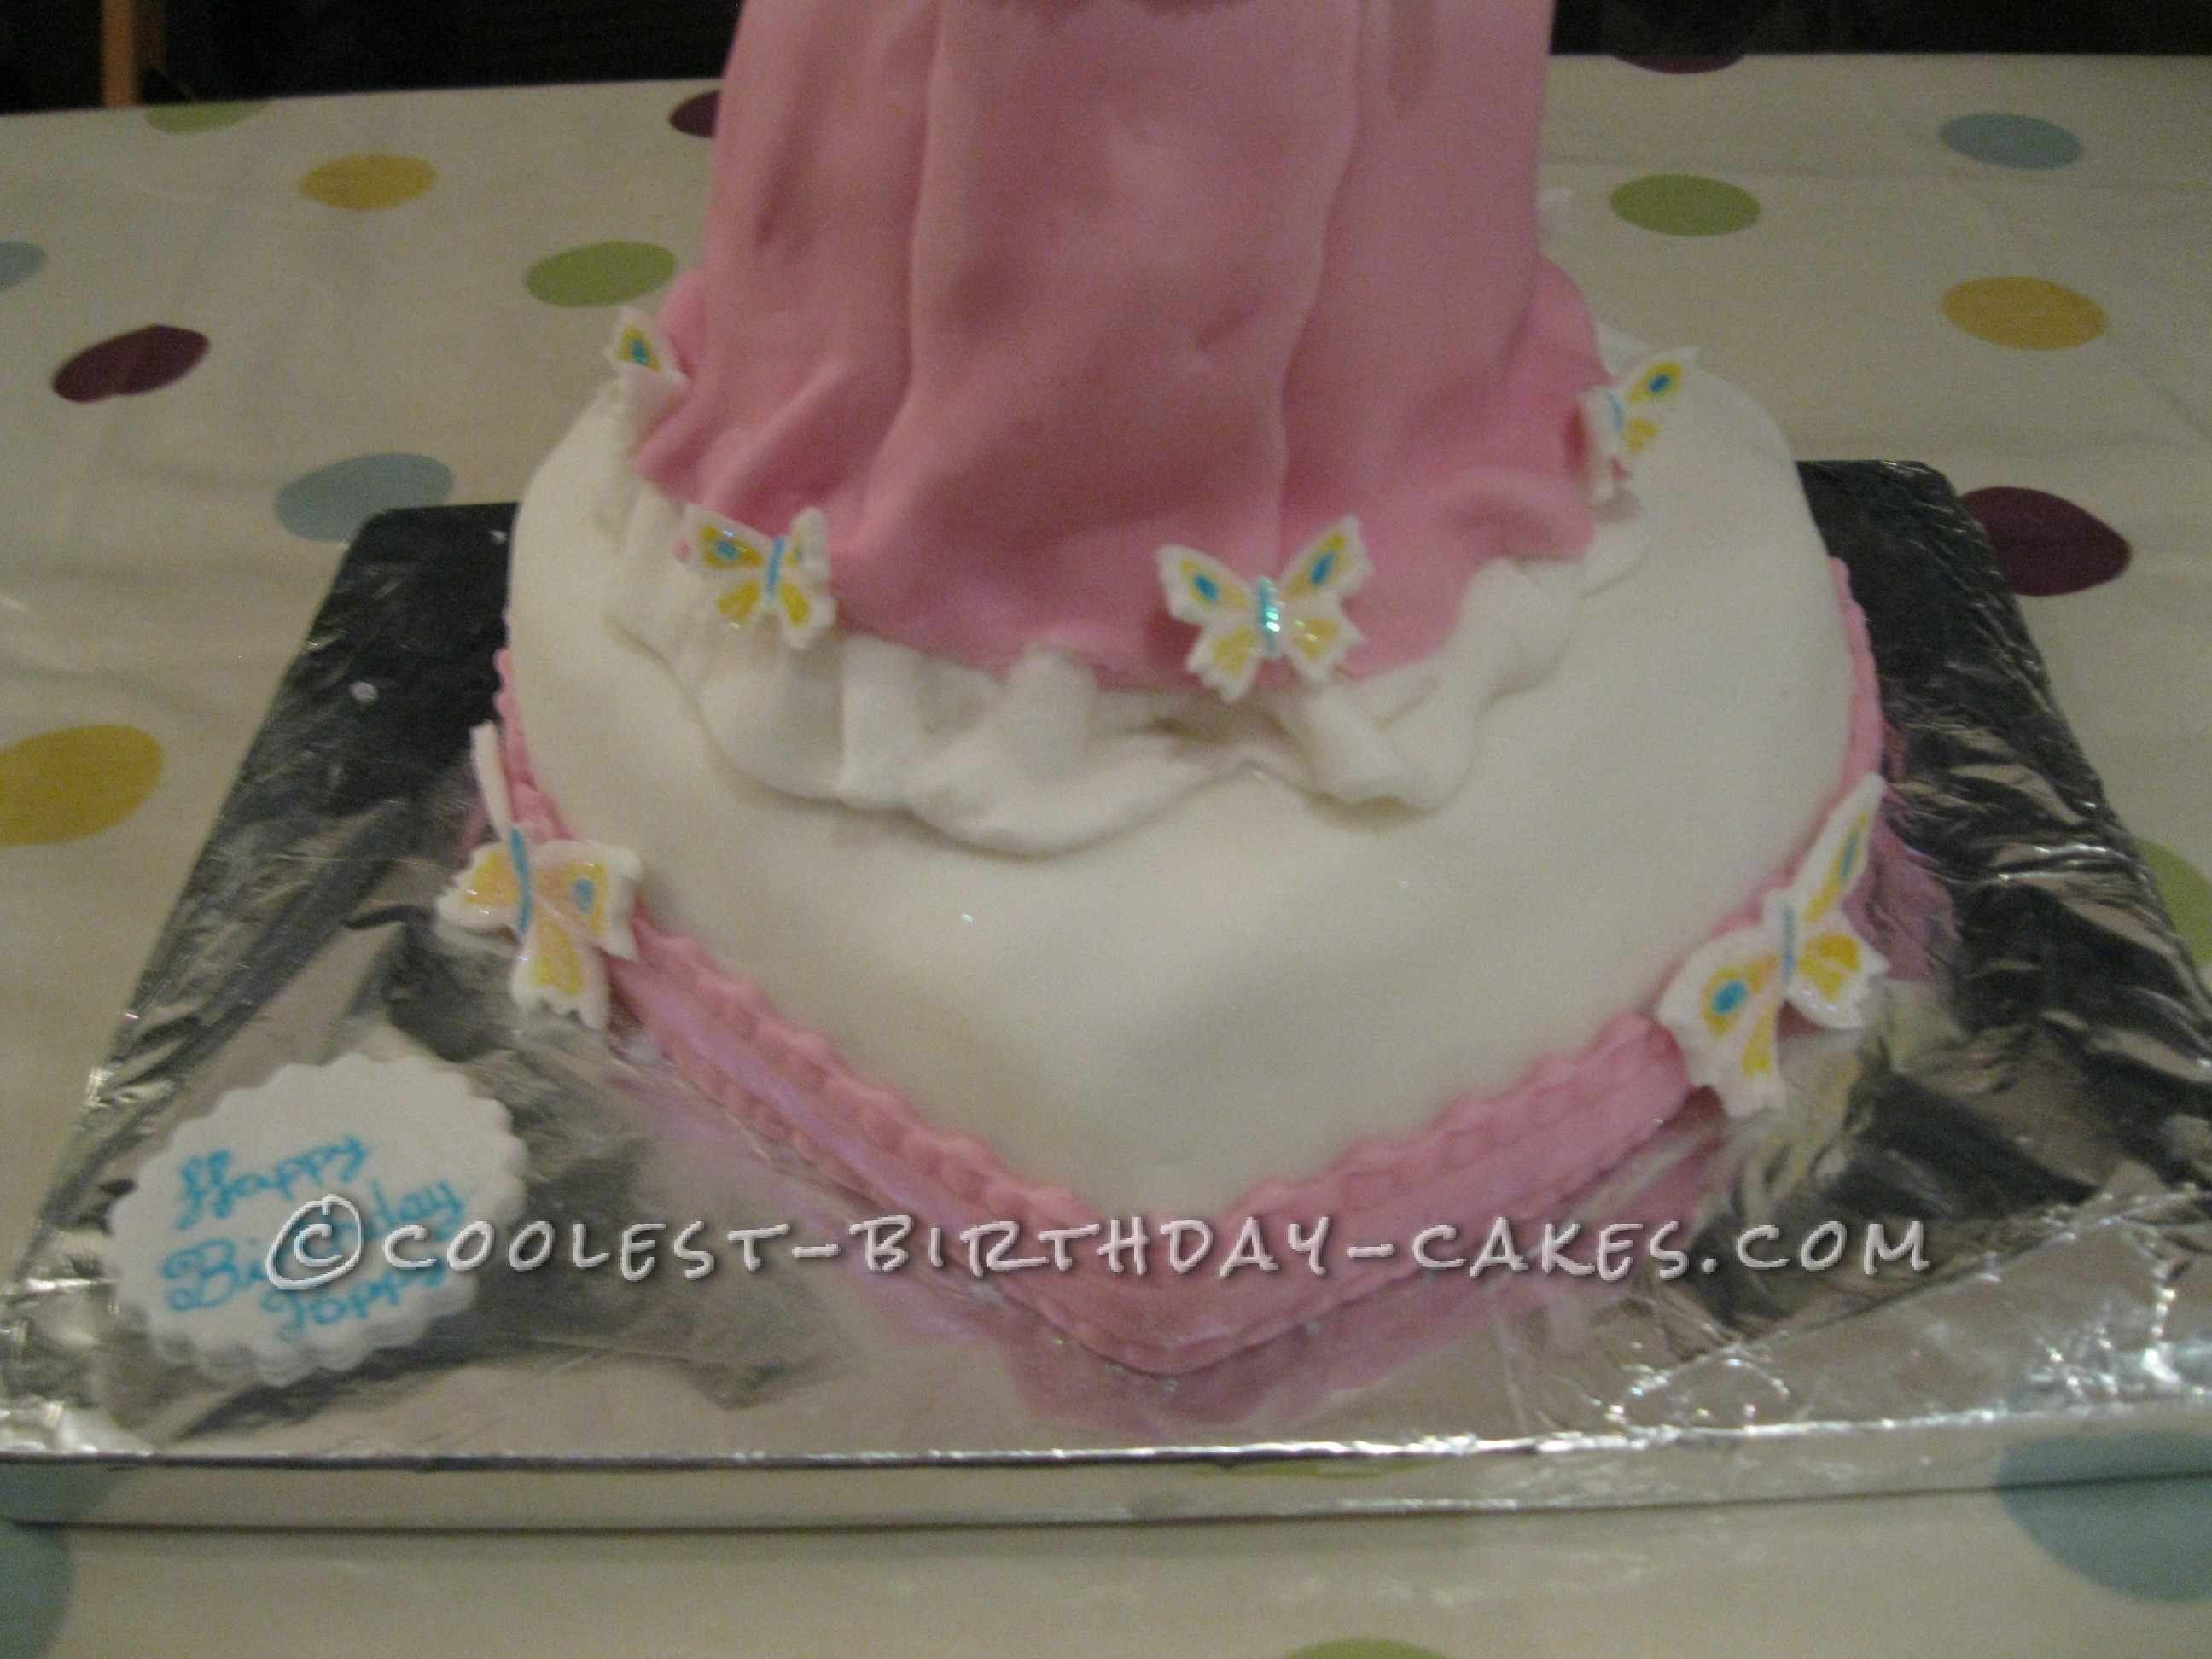 Dazzling Princess Cake Fit for a Princess